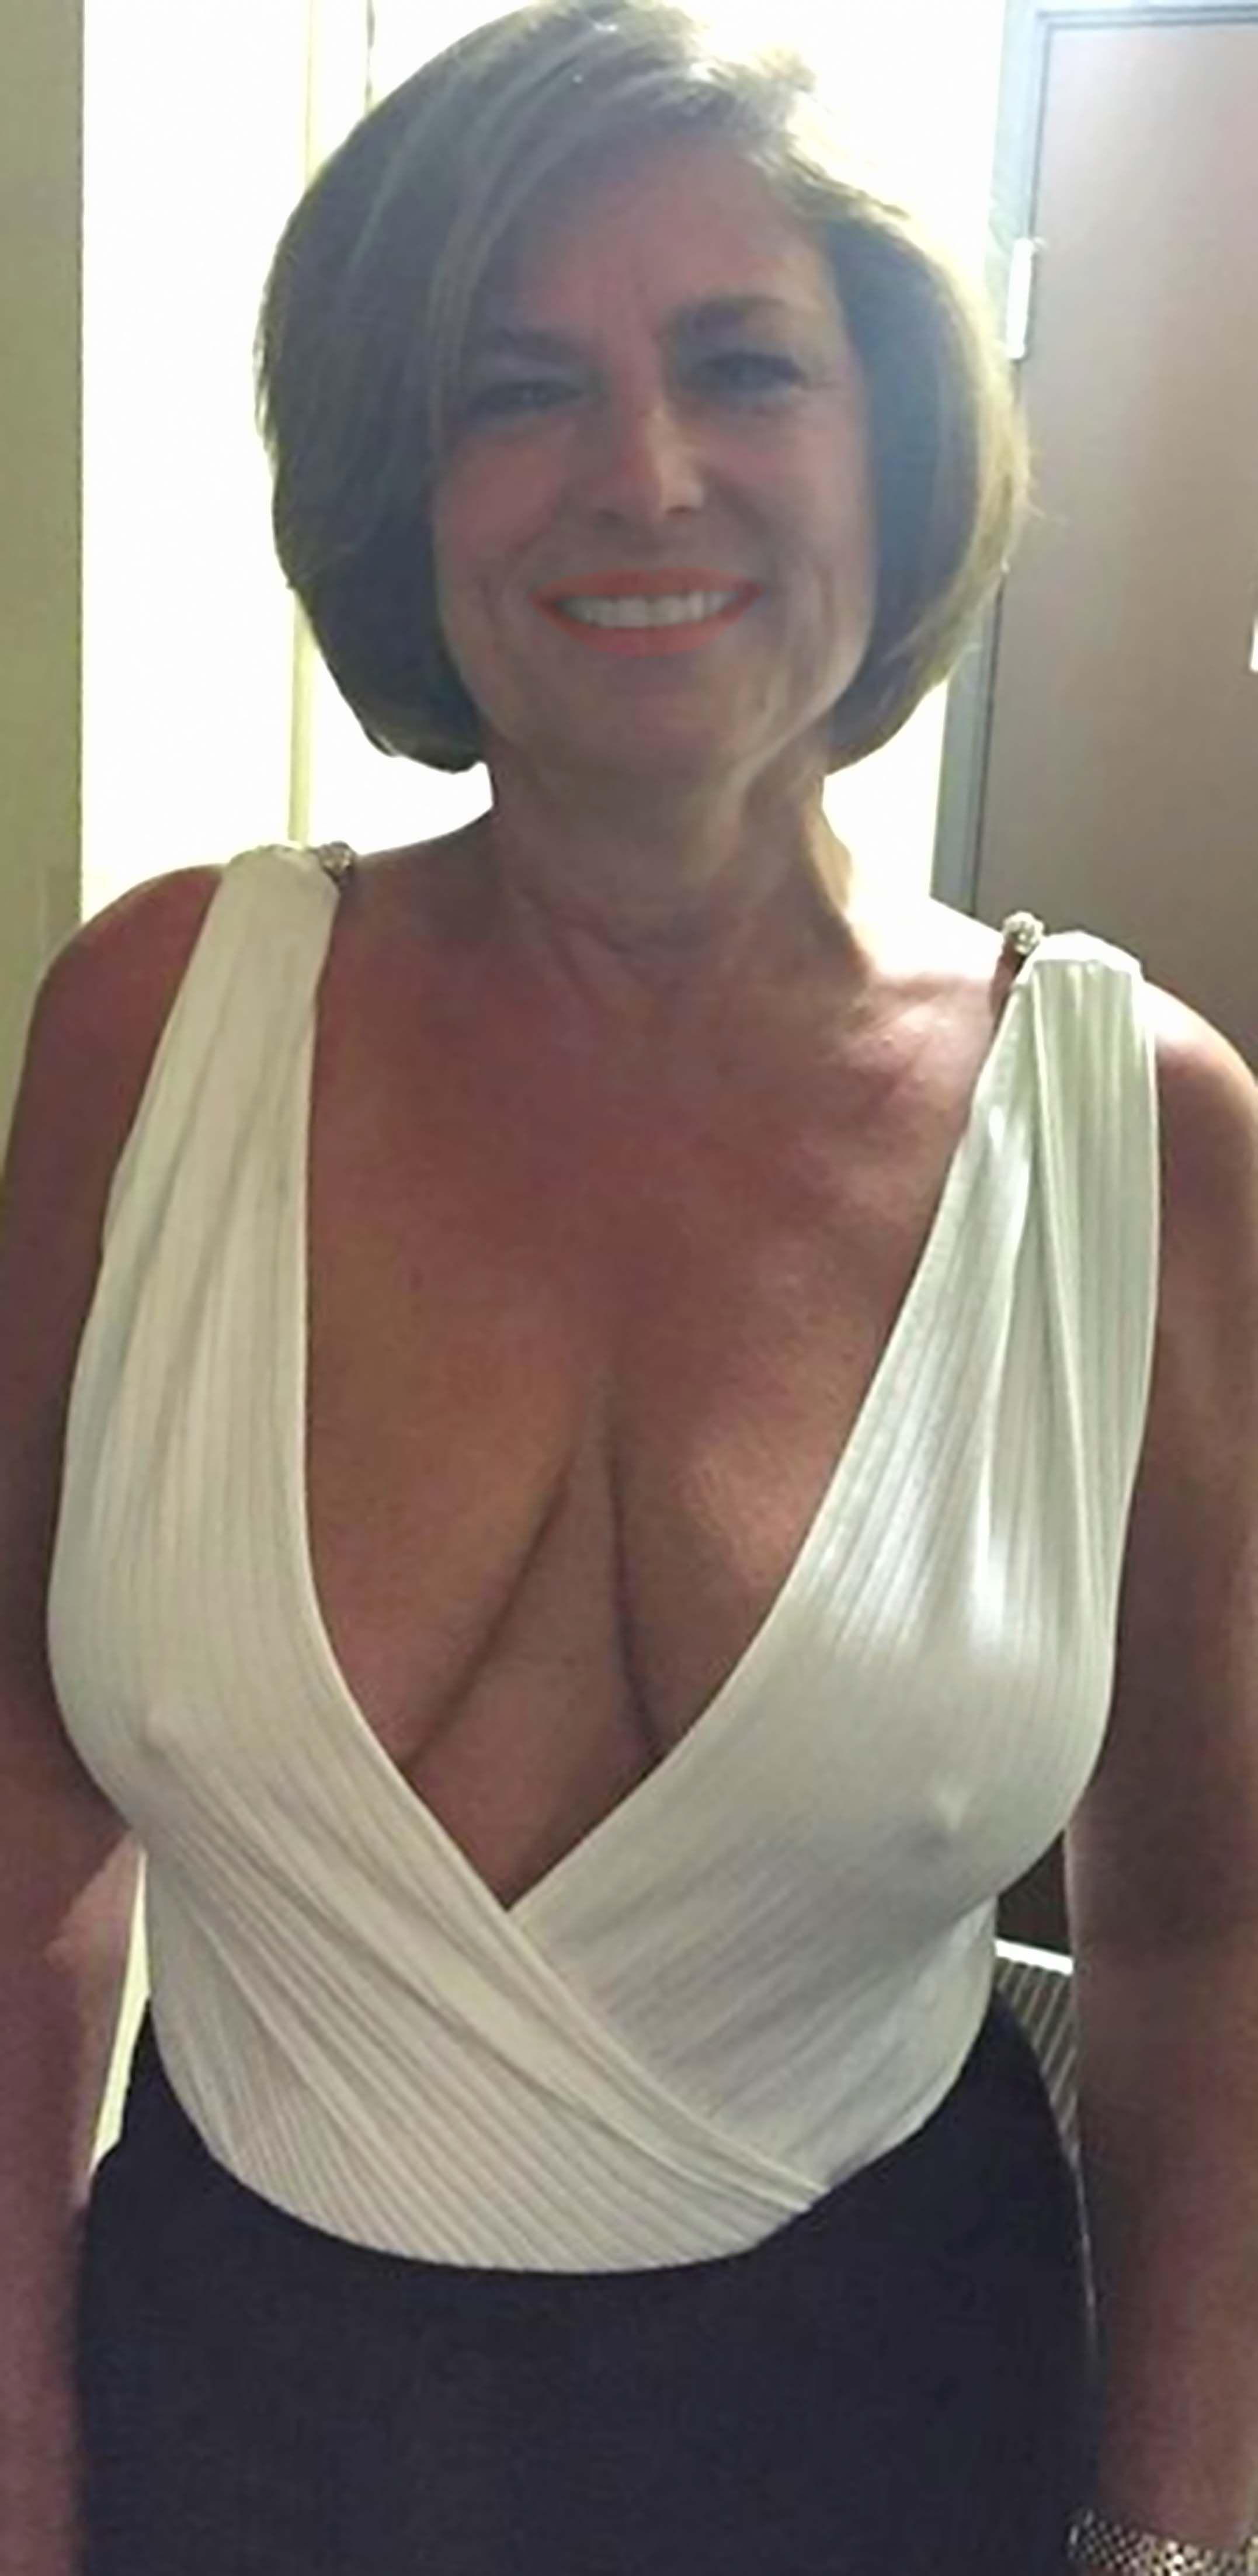 gorgeous woman terrible photo | hot gilf's | pinterest | lenceria